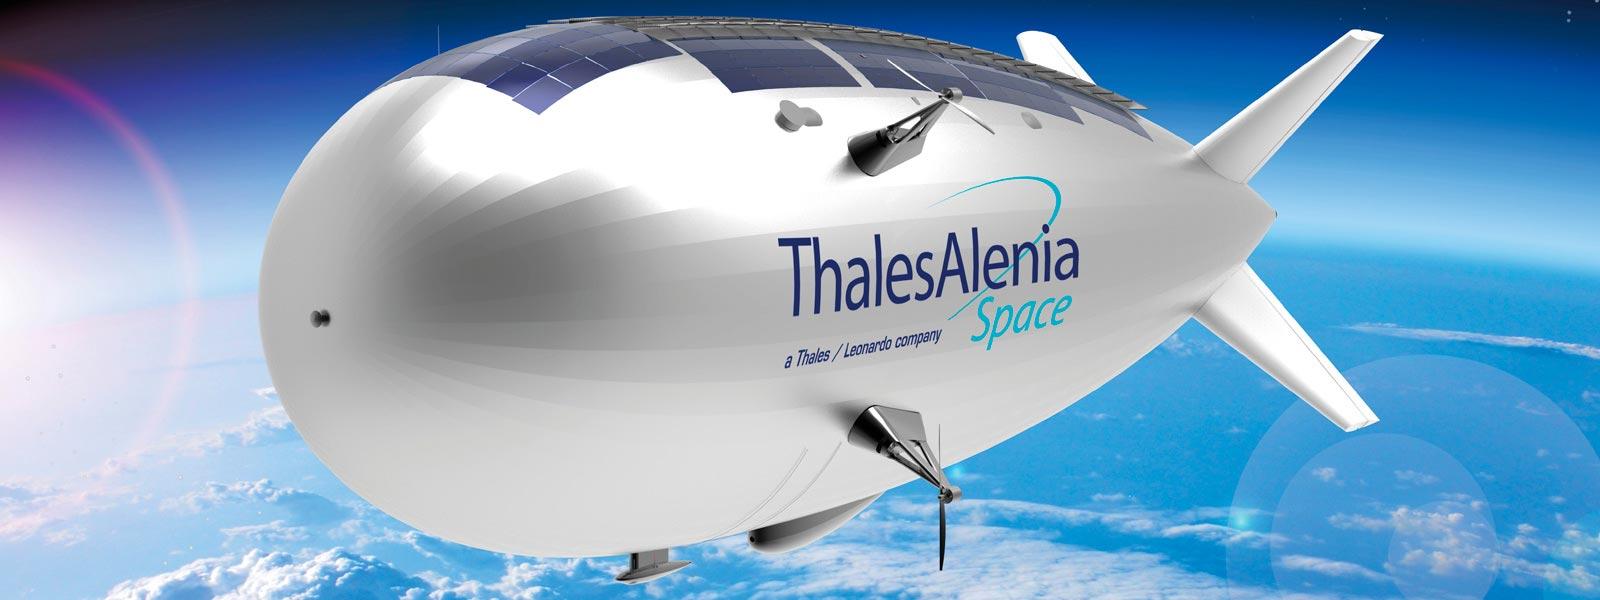 Airstar_Aerospace_Stratobus_Thales_Alenia_Space_Emmanuelle_Briot_s